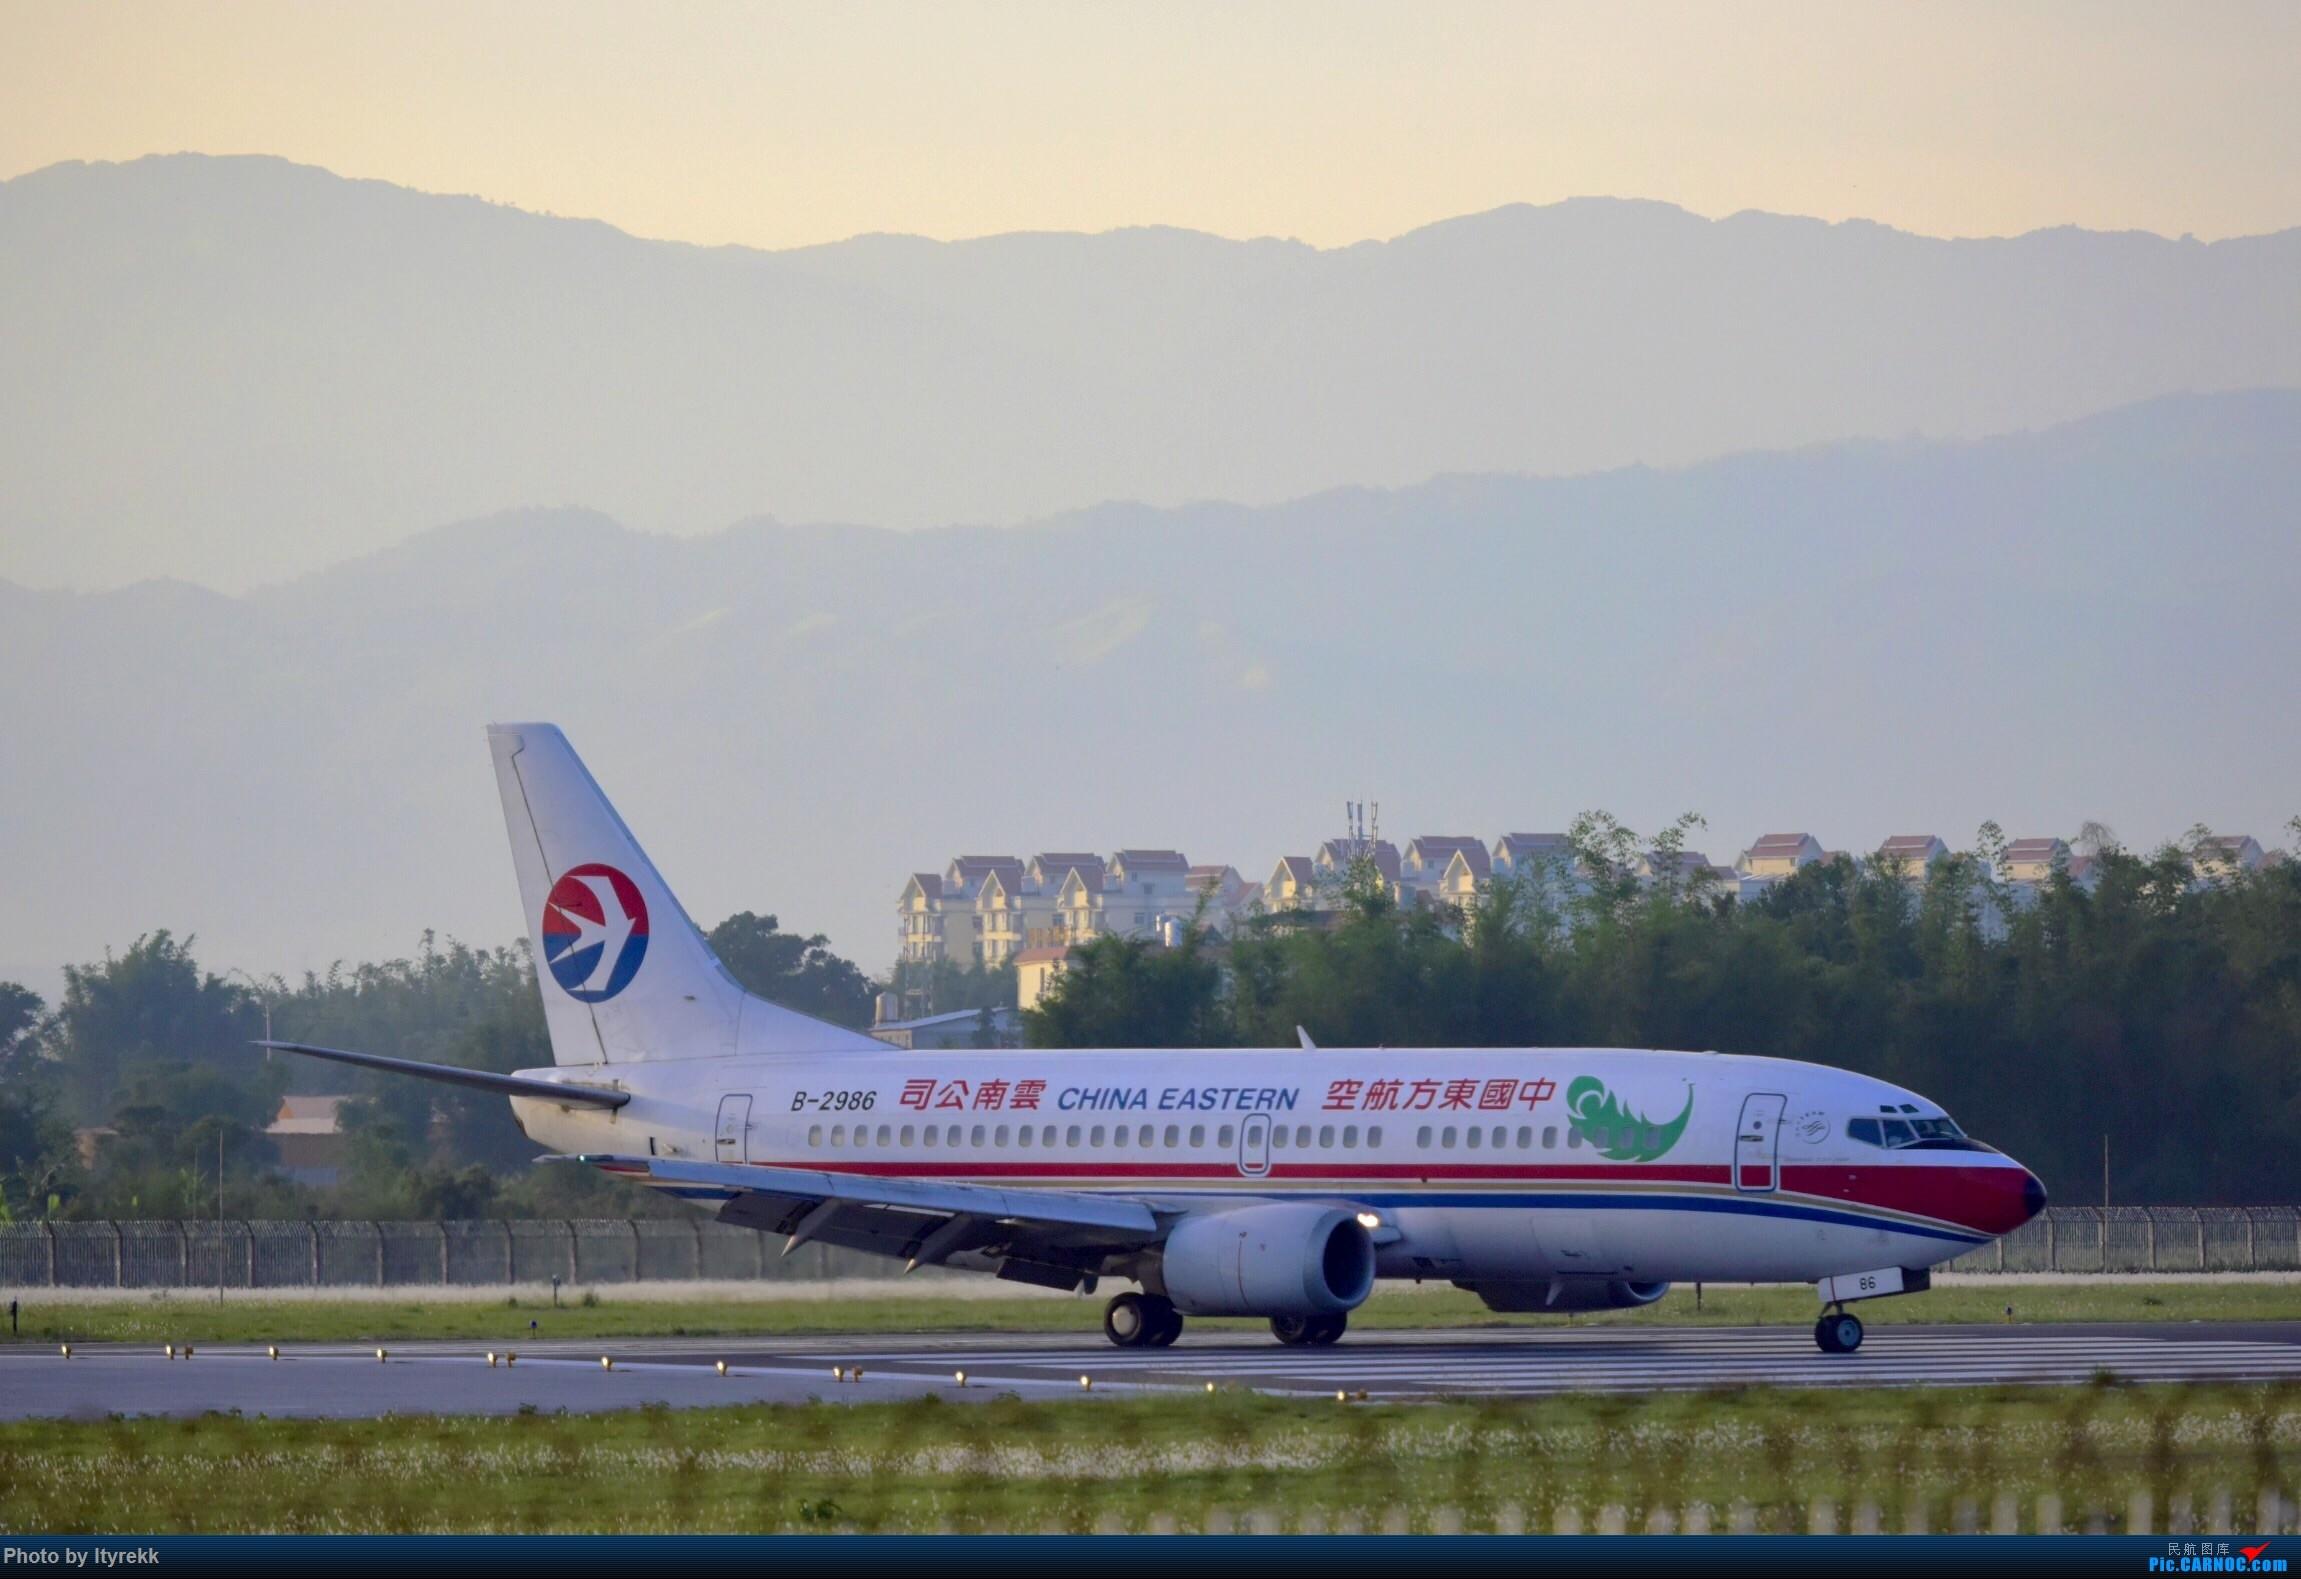 Re:[原创]【5.23LUM】玩腻了楼顶拍,来一次现场版的!求小飞机 BOEING 737-300 B-2986 中国芒市机场